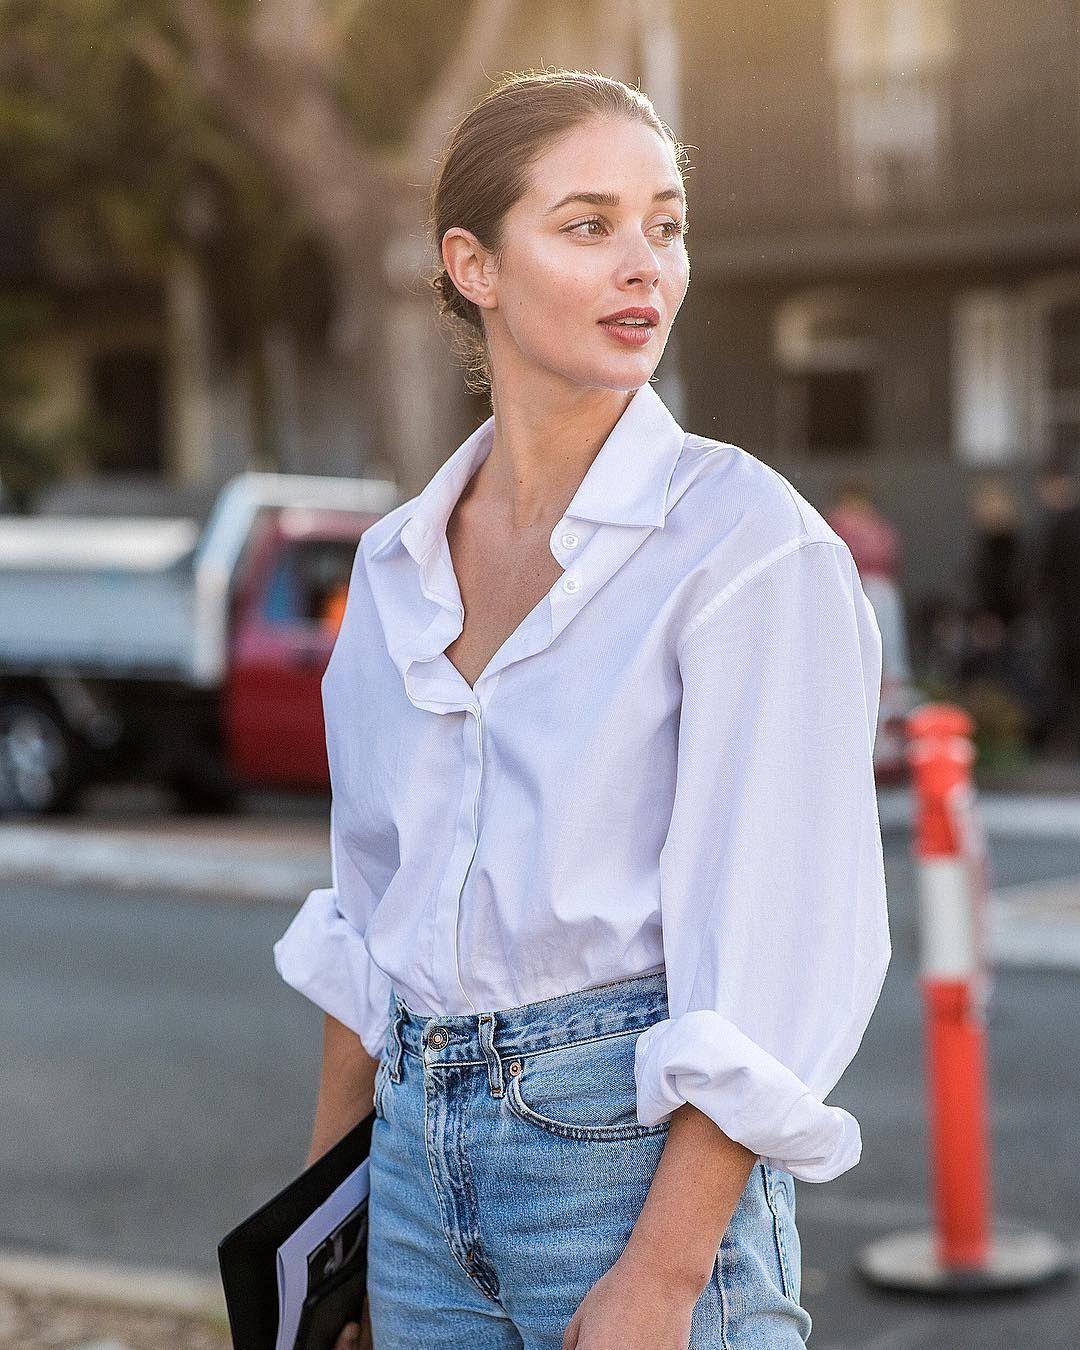 Latest lace dress styles 2018  Pin by Laura Jayne Scott Taylor on W a r d r o b e  Pinterest